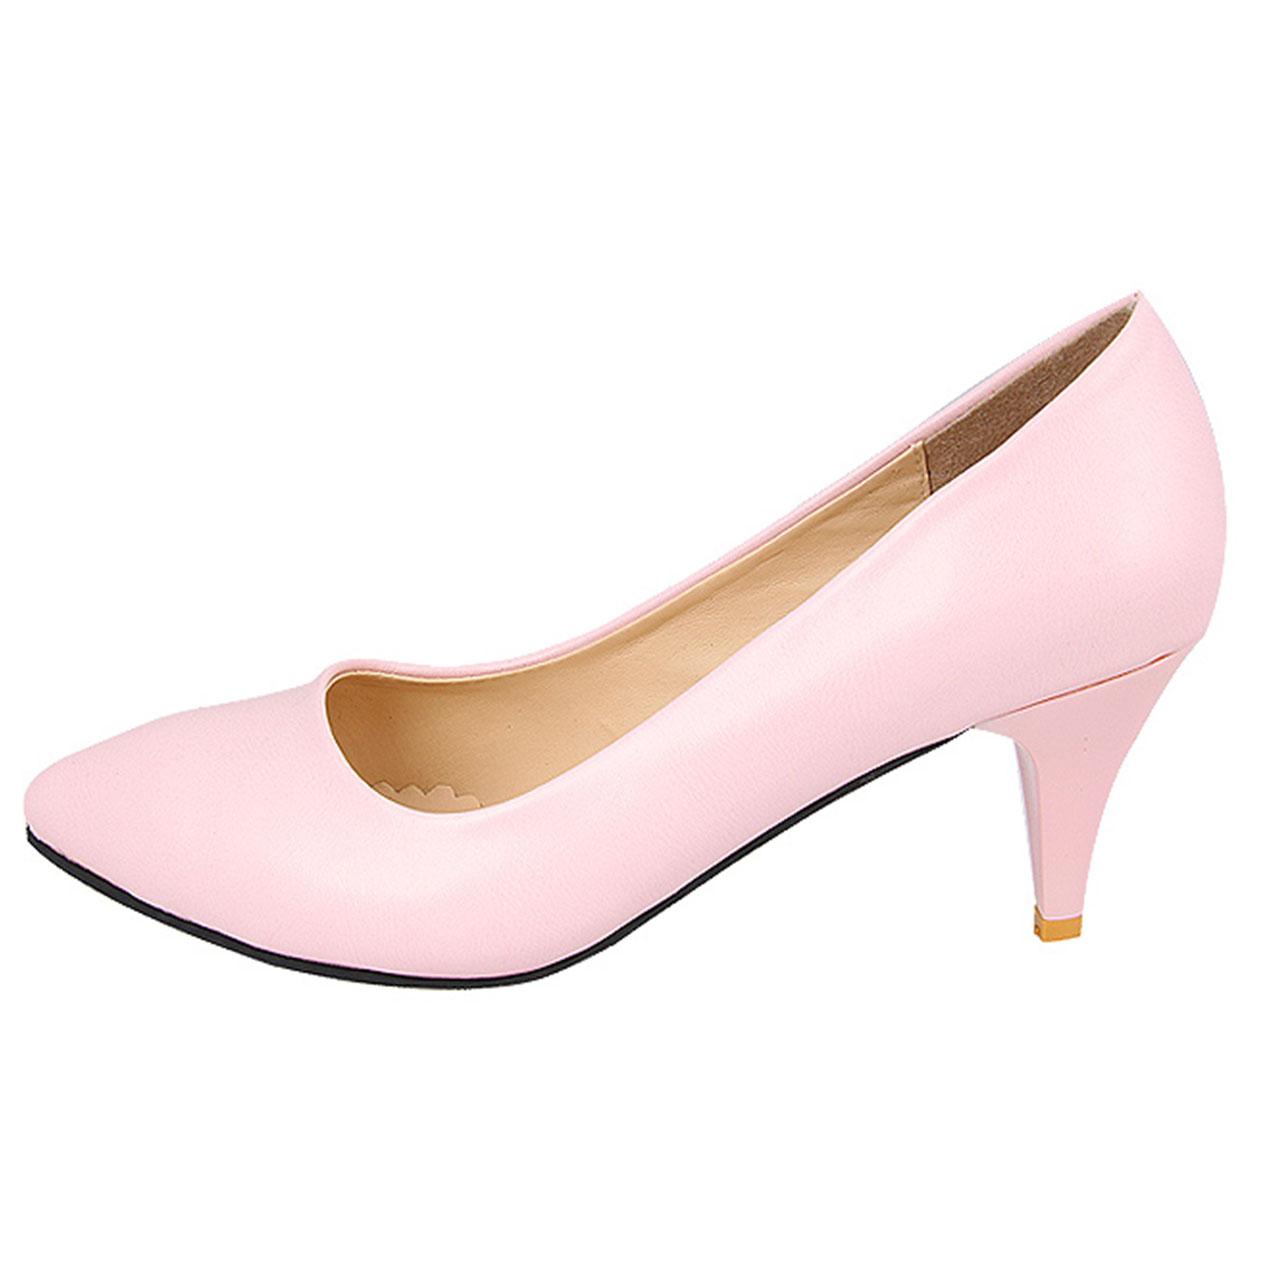 کفش زنانه مادام طرح لودوشکا کد 160013004